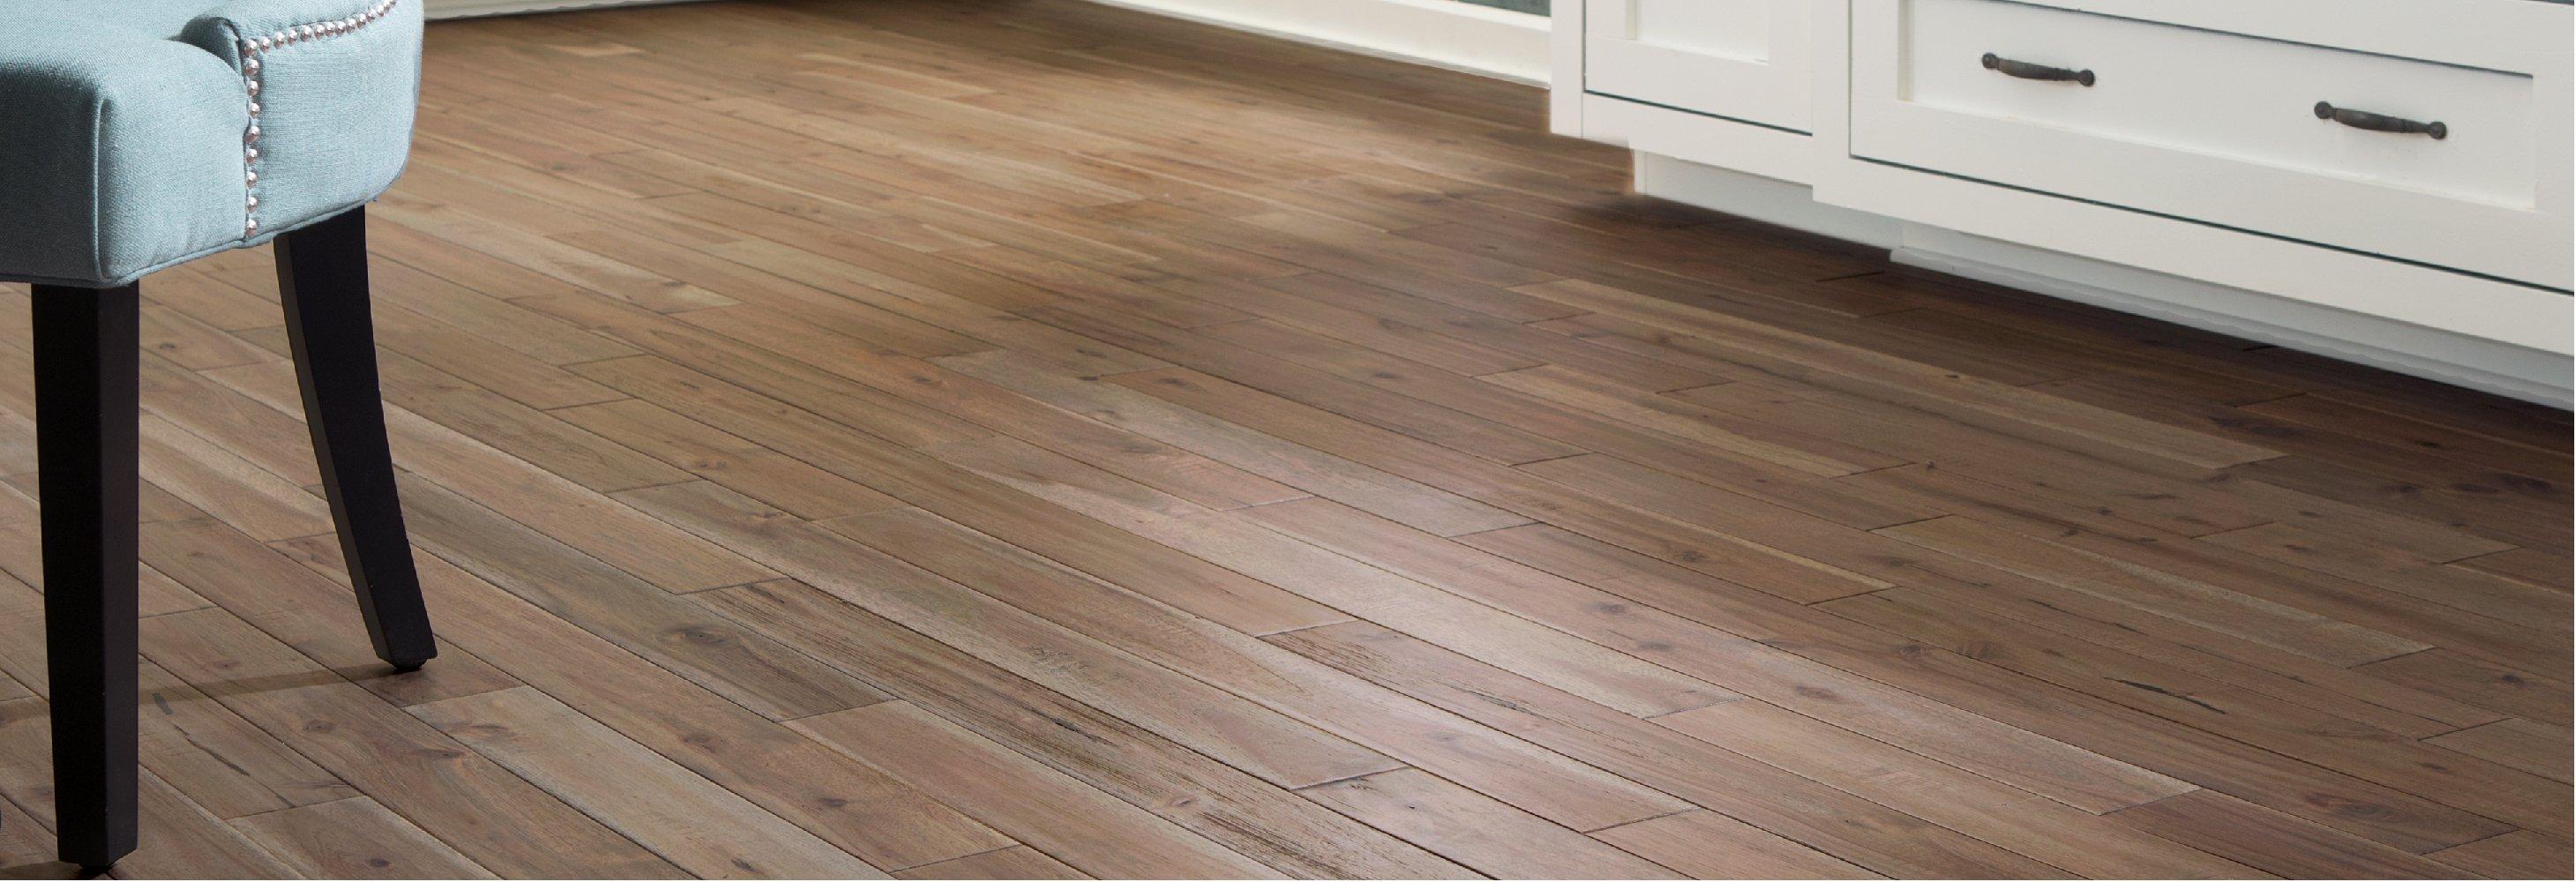 prefinished hardwood flooring solid hardwood flooring BKXTXOZ